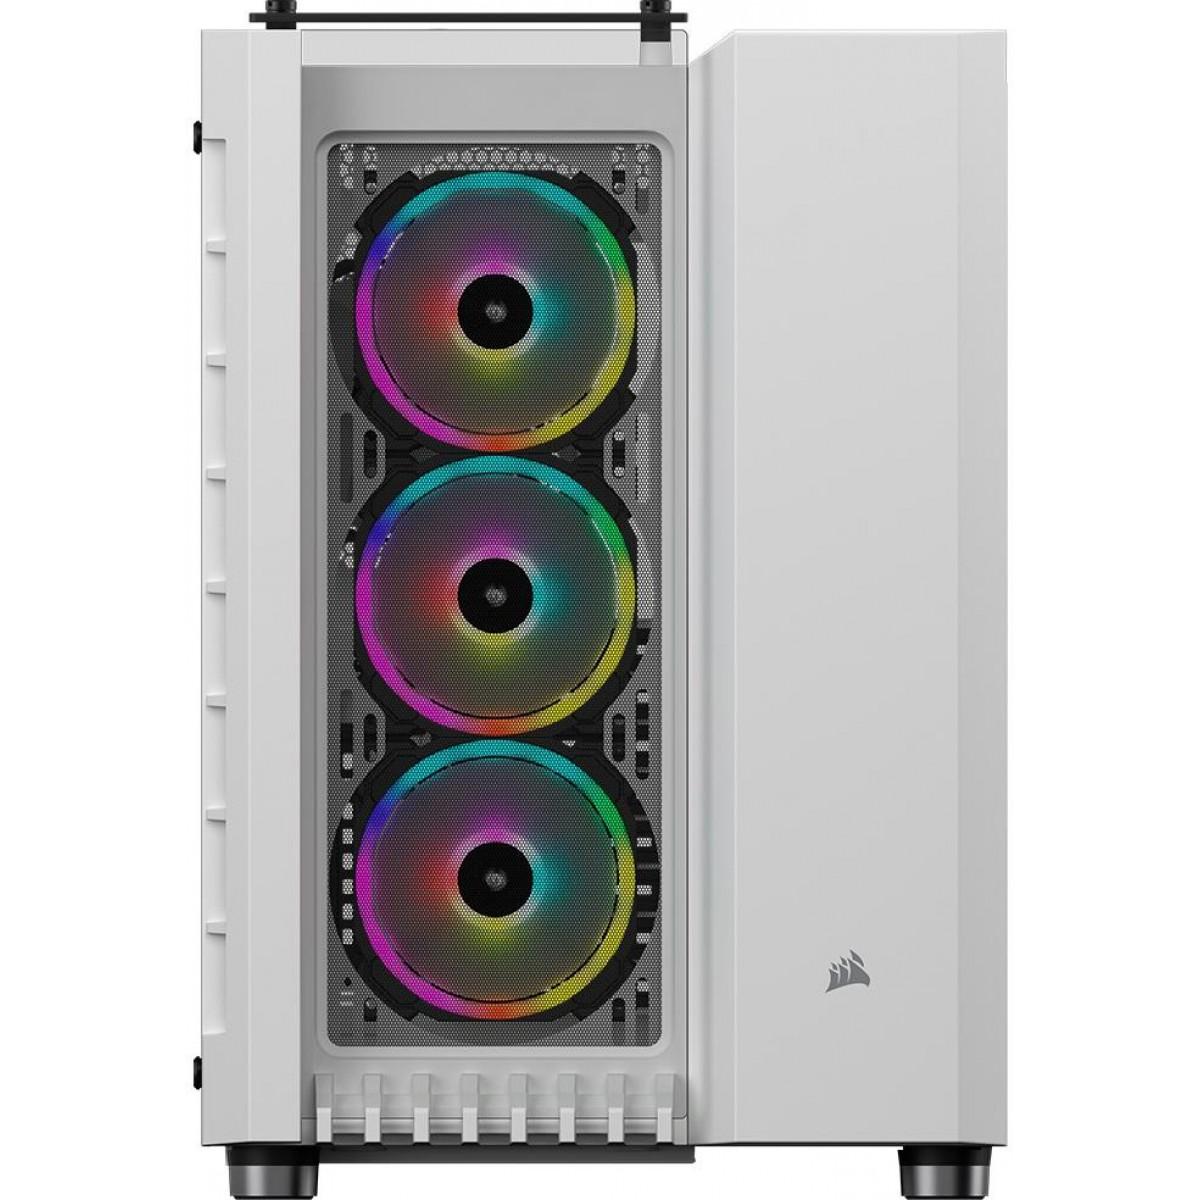 Gabinete Gamer Corsair Crystal 680x RGB, Full Tower, Vidro Temperado, 4 Fans, White, S-Fonte, CC-9011169-WW